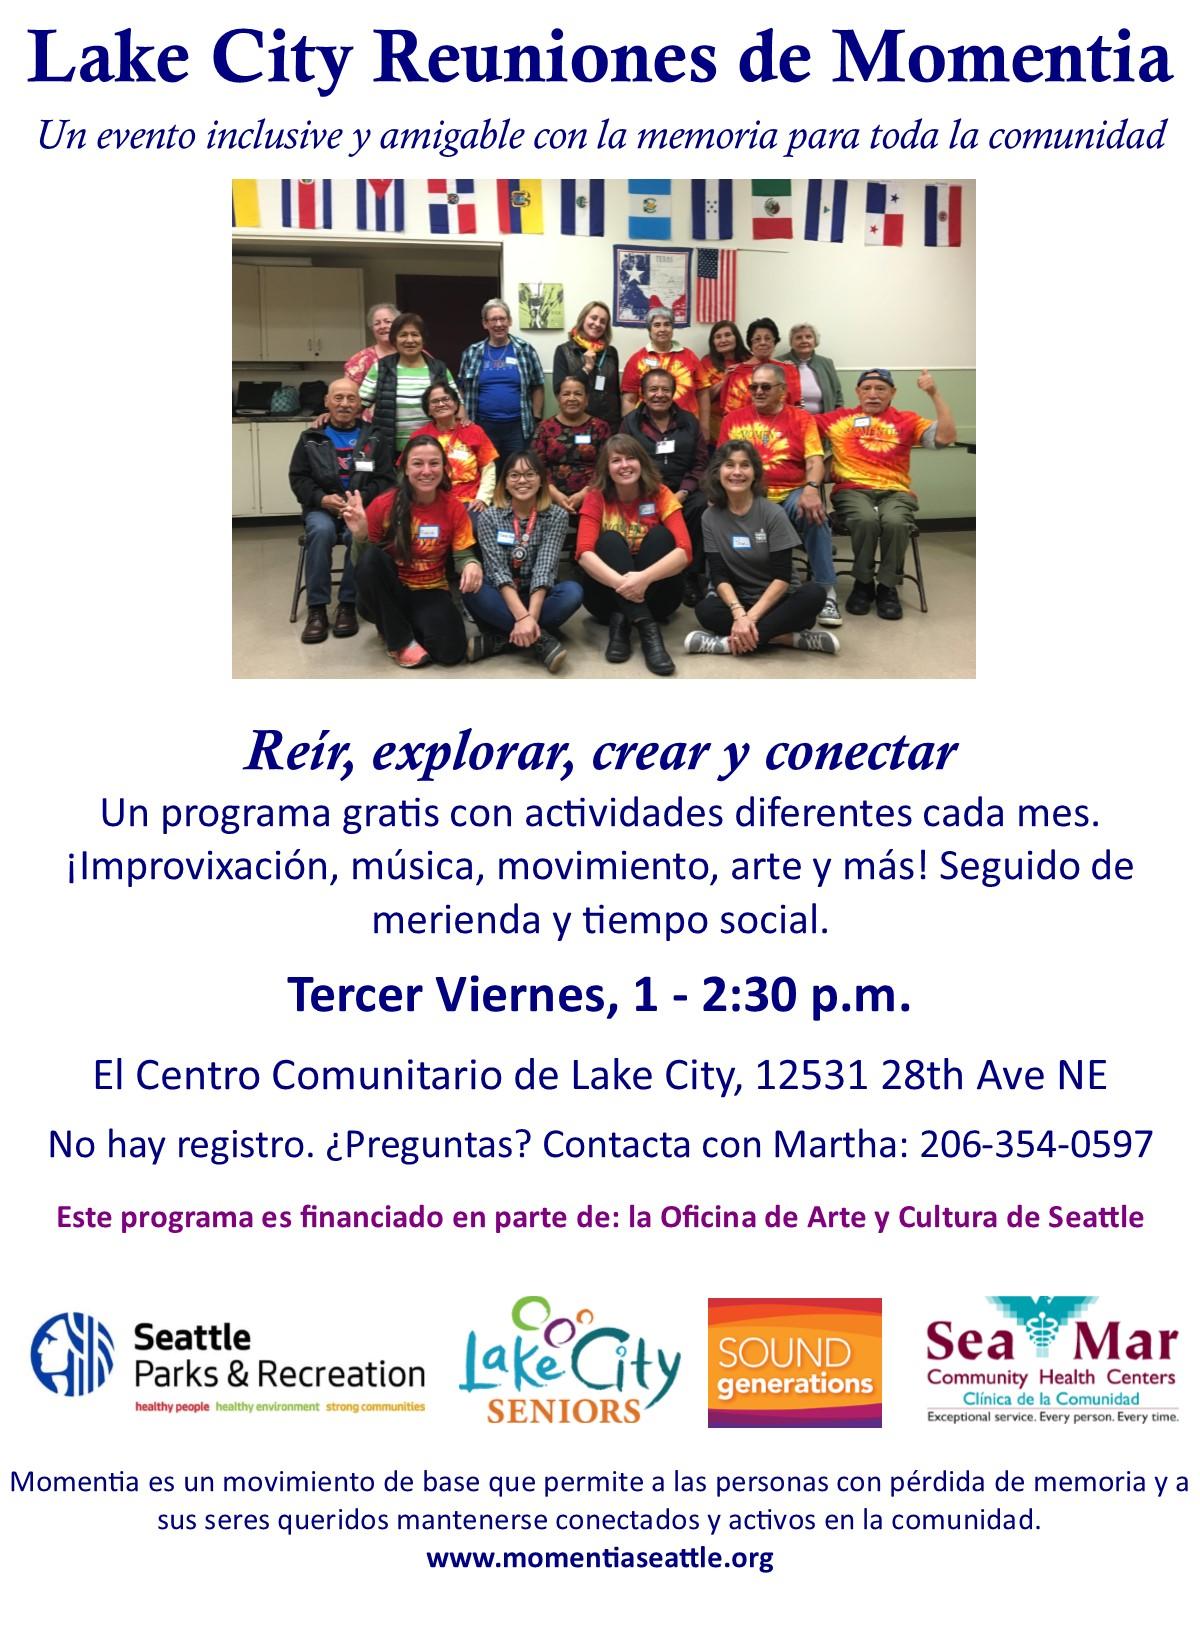 Lake City Momentia mini flyers Spanish.jpg